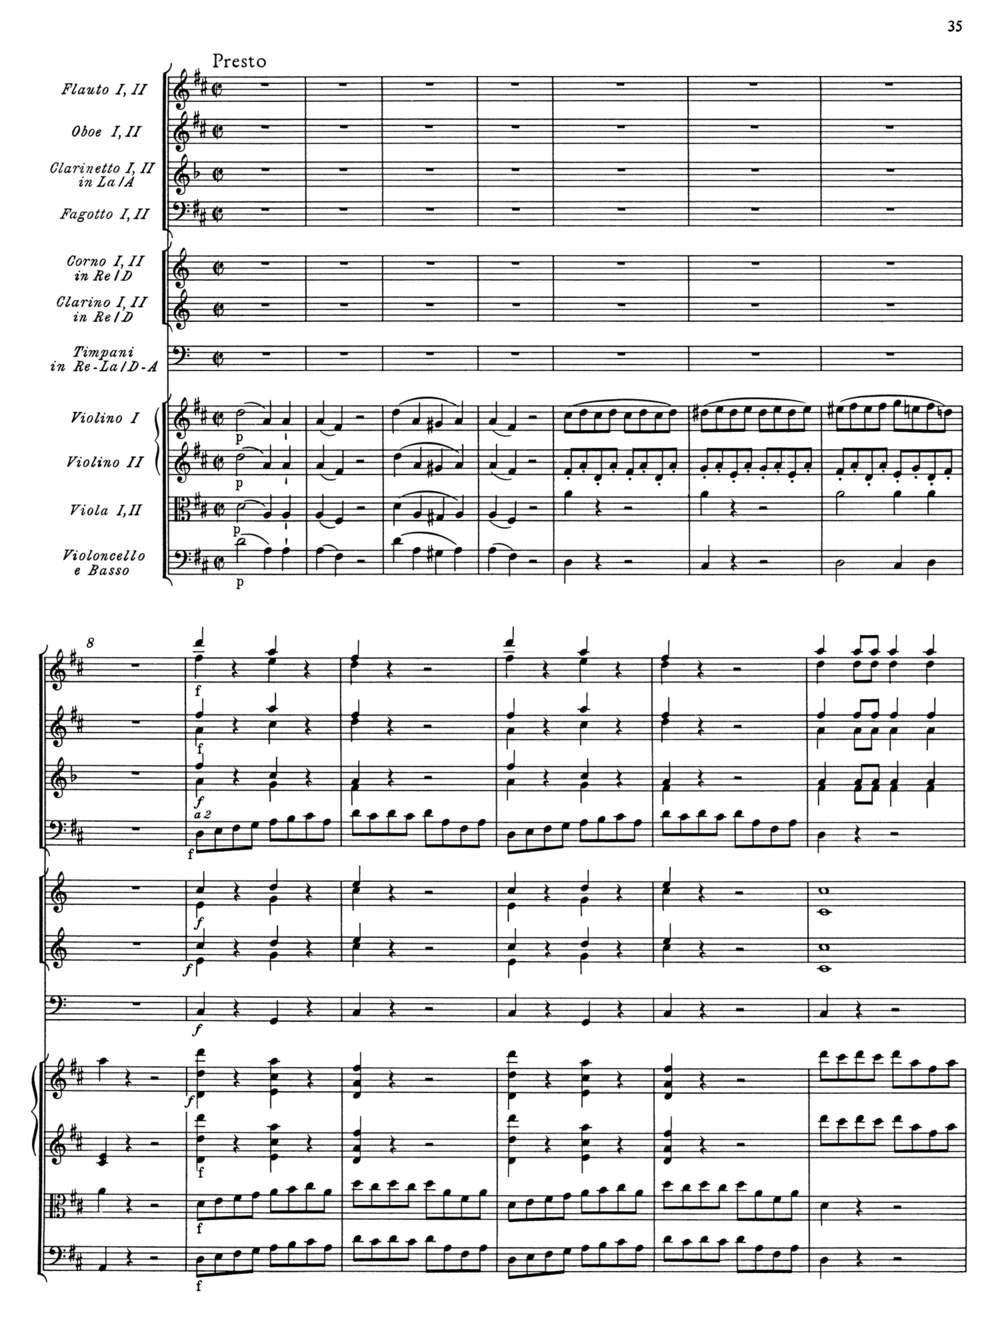 Haffner SCORE page 1.jpg